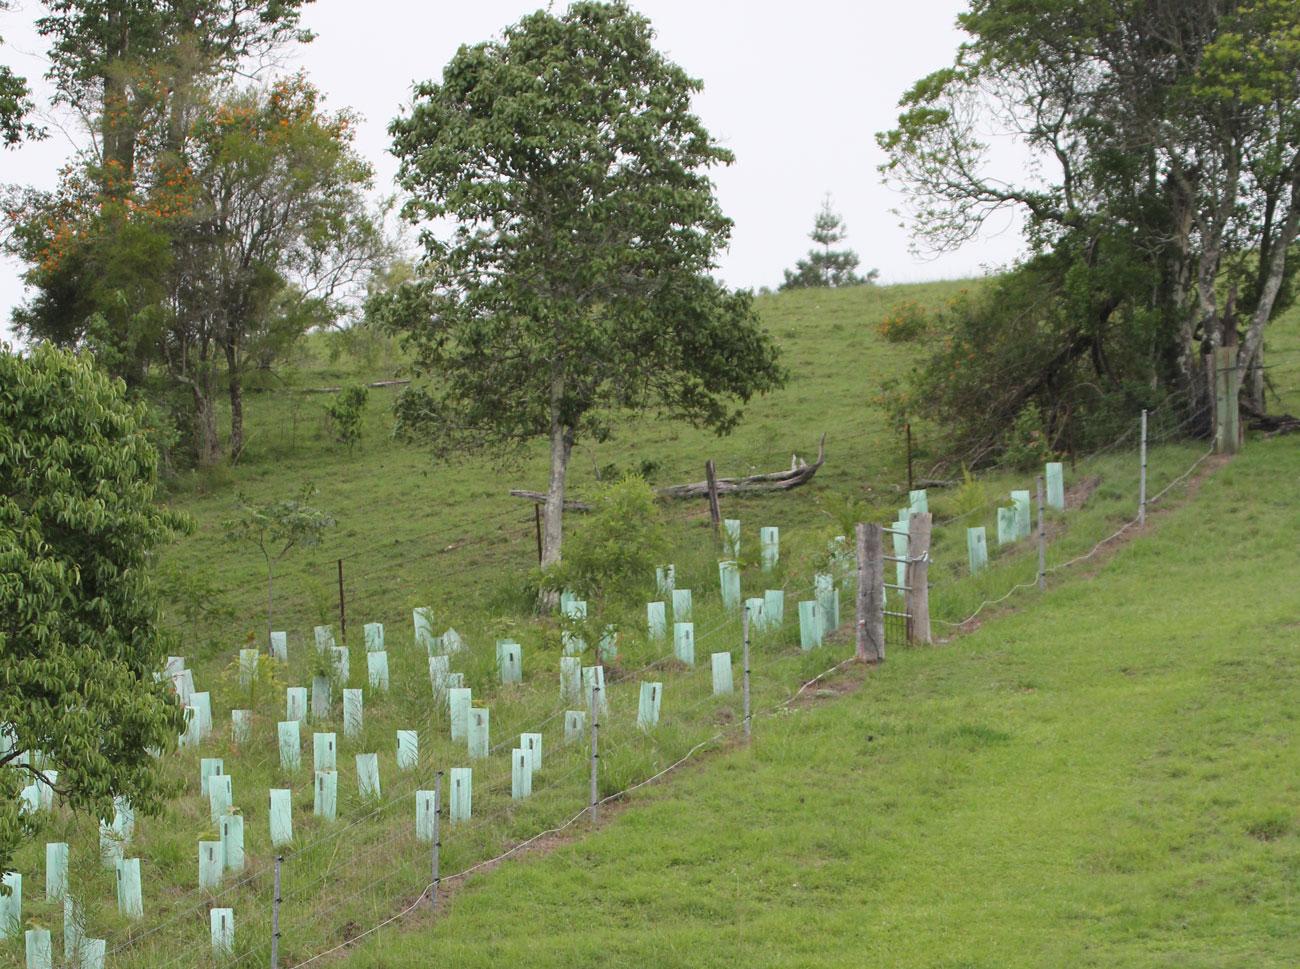 Connecting Vegetation